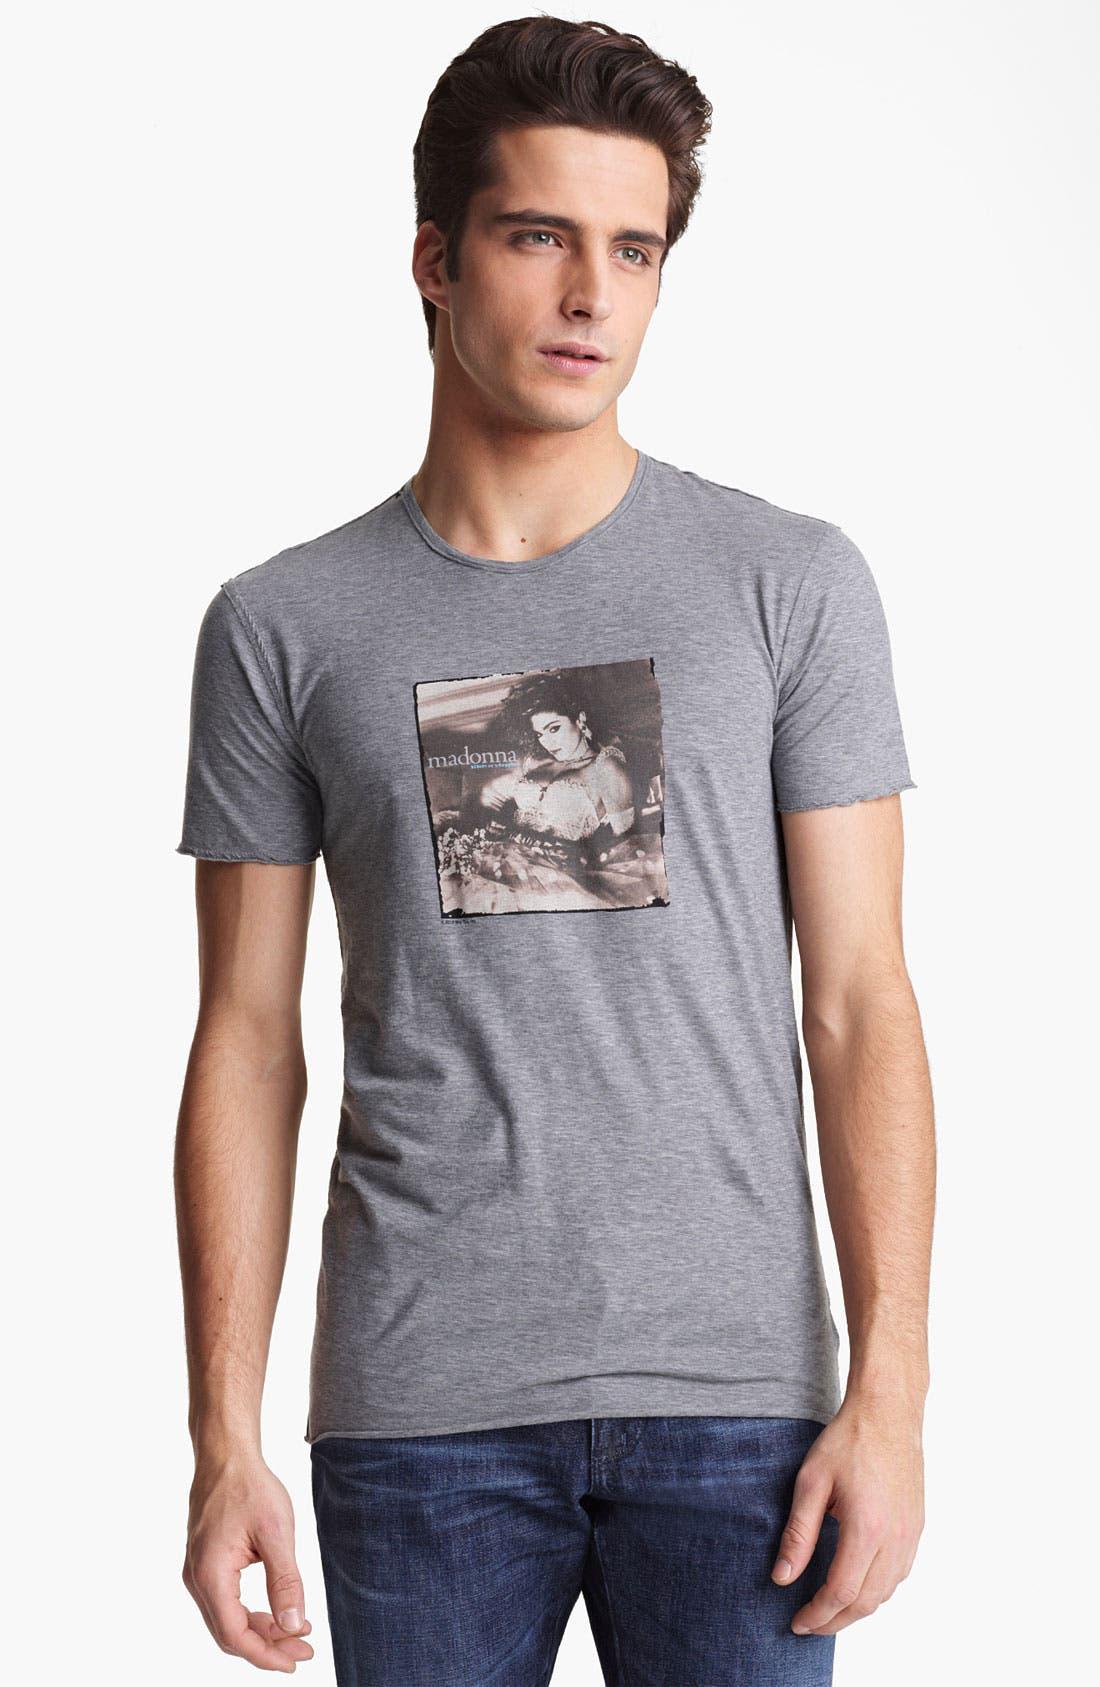 Alternate Image 1 Selected - Dolce&Gabbana 'Madonna - Like a Virgin' Graphic T-Shirt